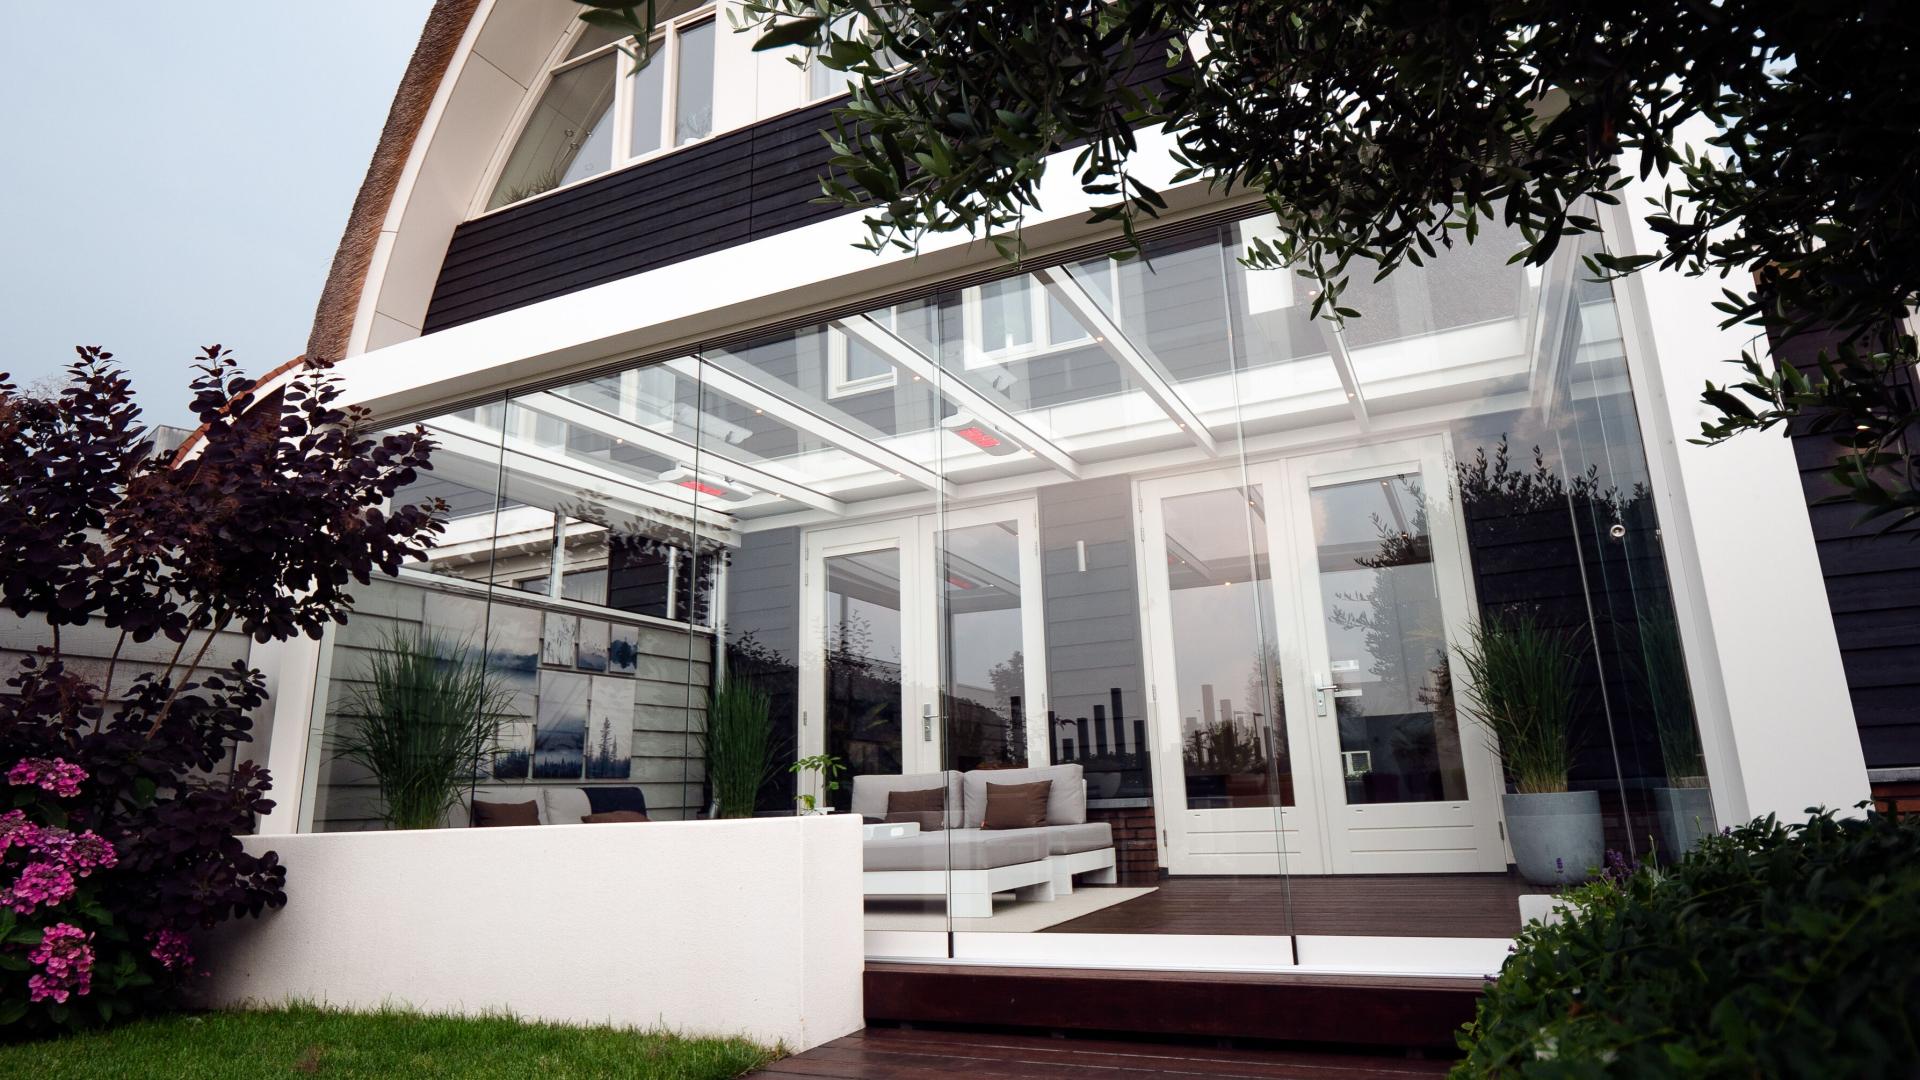 Verasol Highline Cube, design en degelijkheid komen samen-zsm zonwering